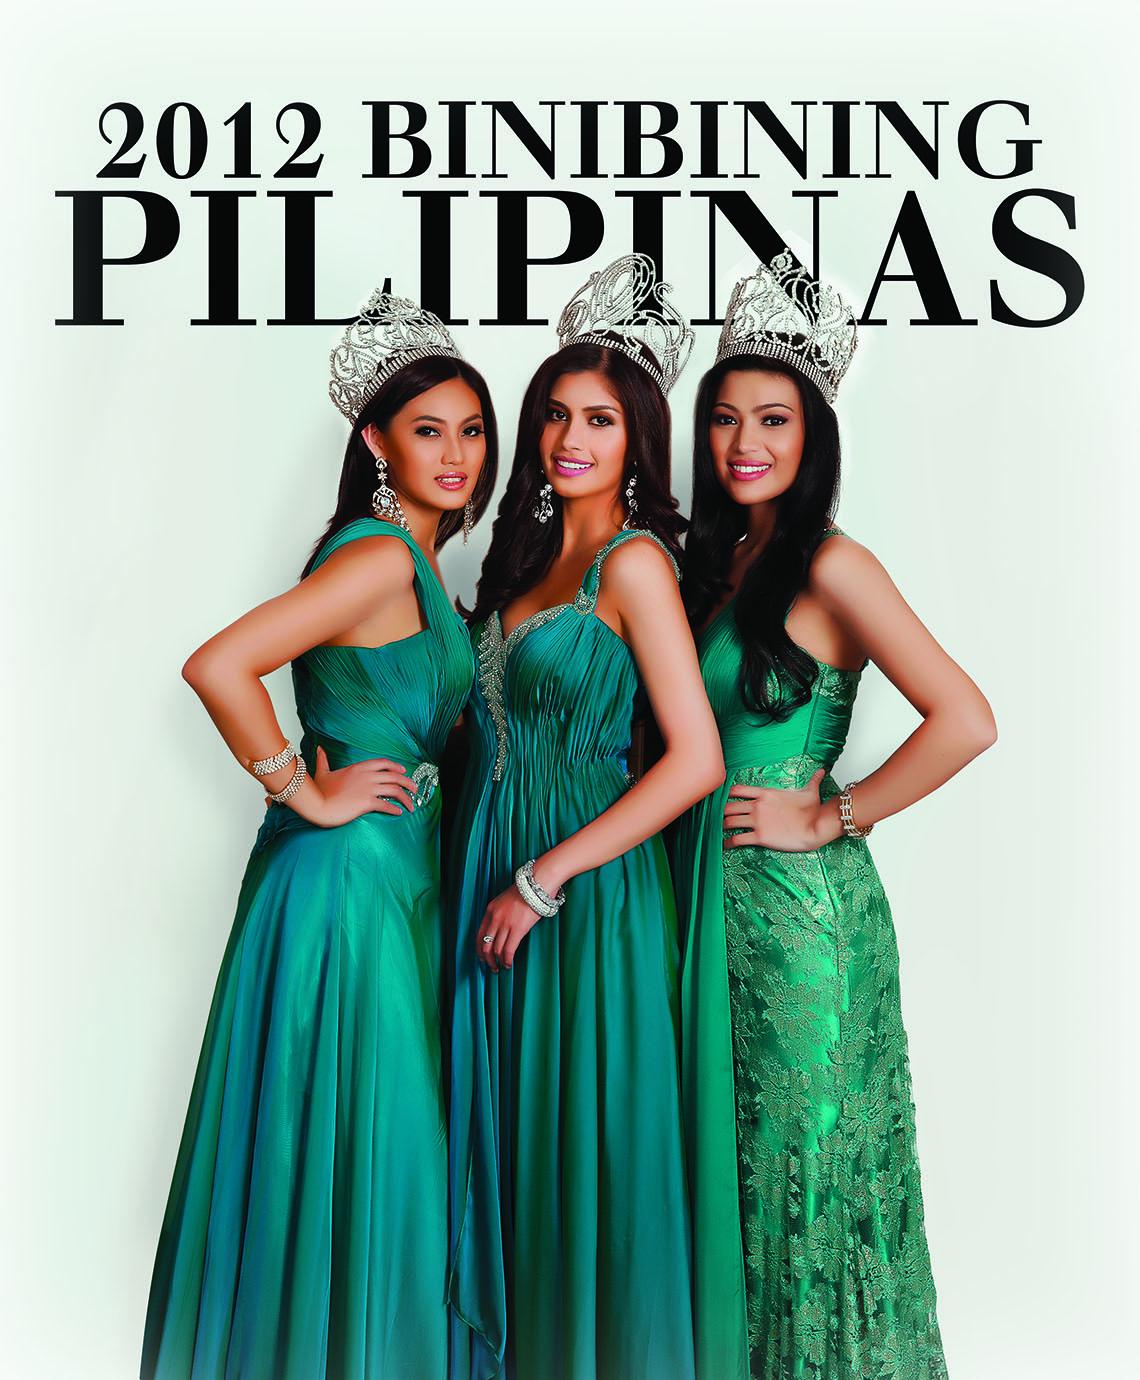 BBPMag 2012(1)